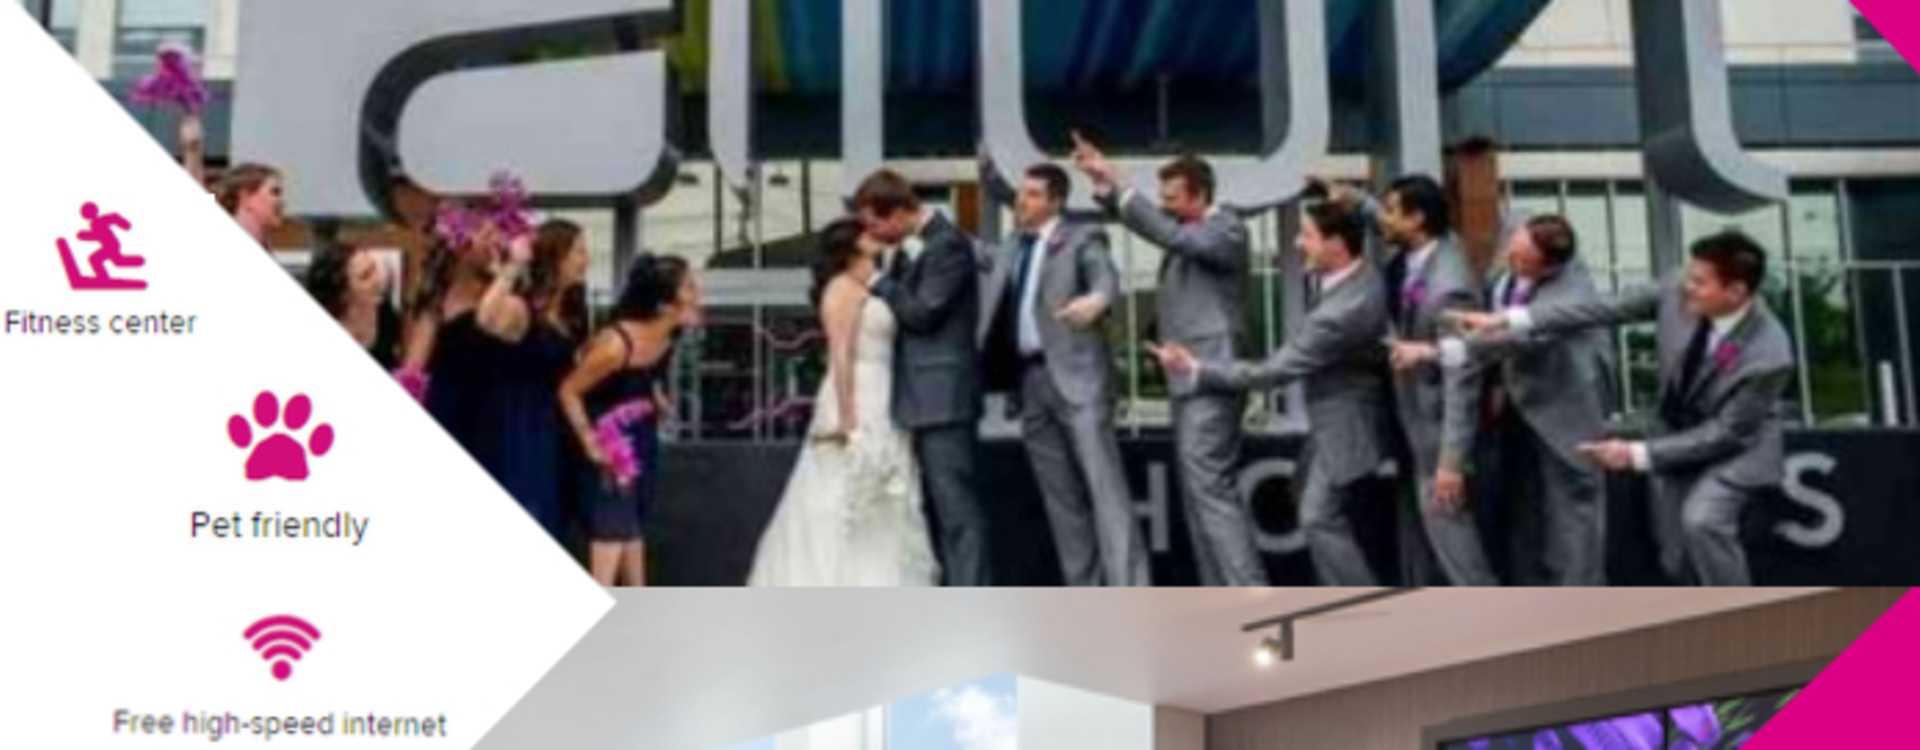 Weddings at Aloft Seattle Sea-Tac Airport